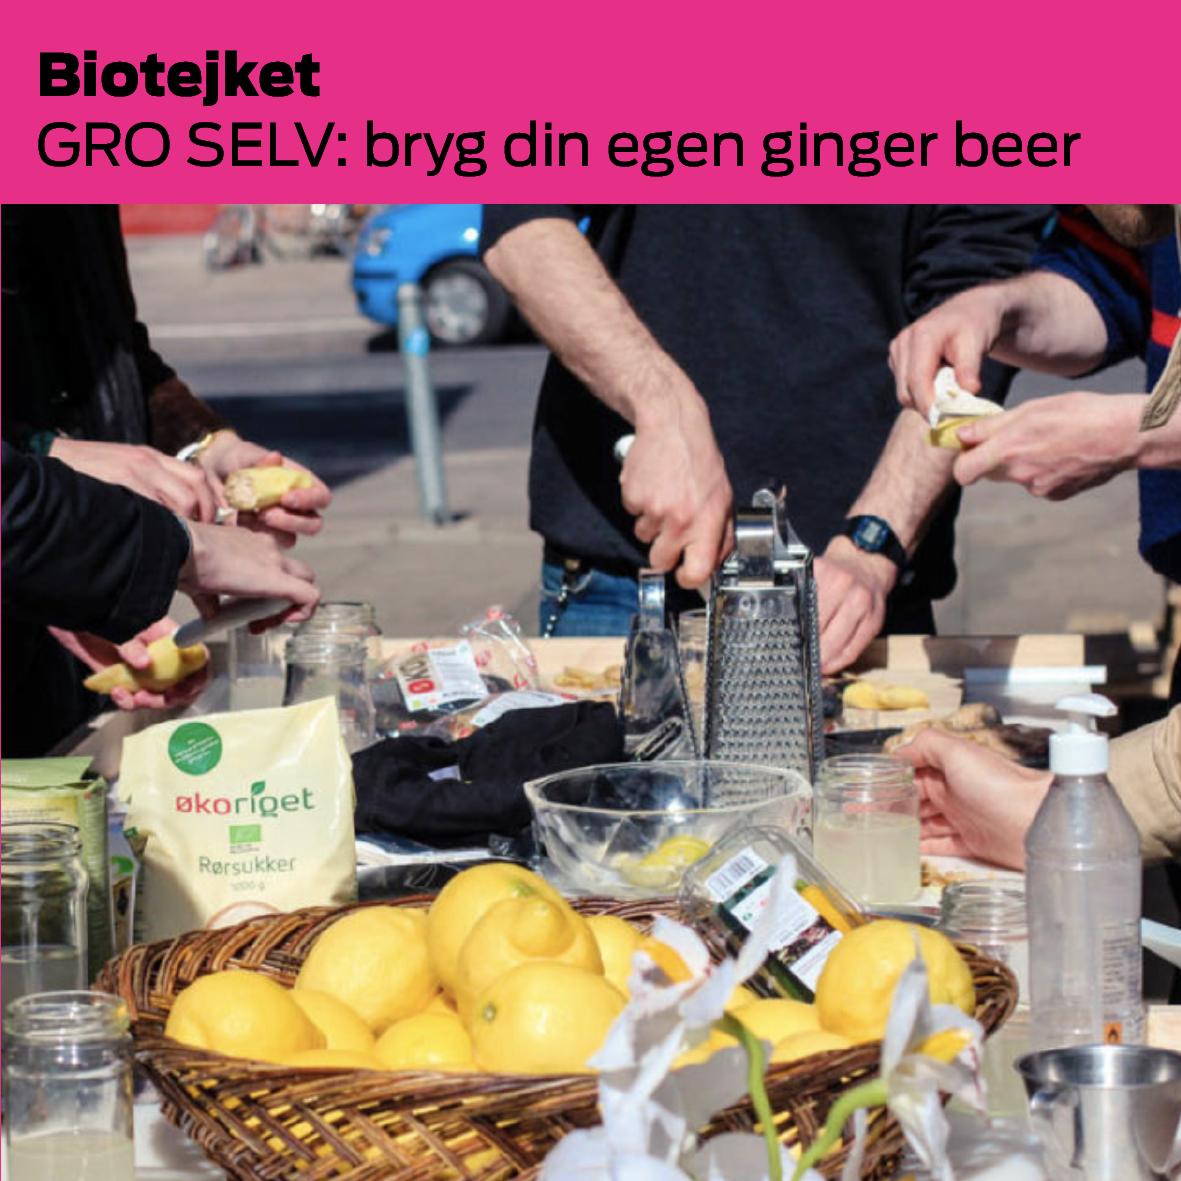 Bioteket & GRO SELV (DK): Bryg din egen ginger beer